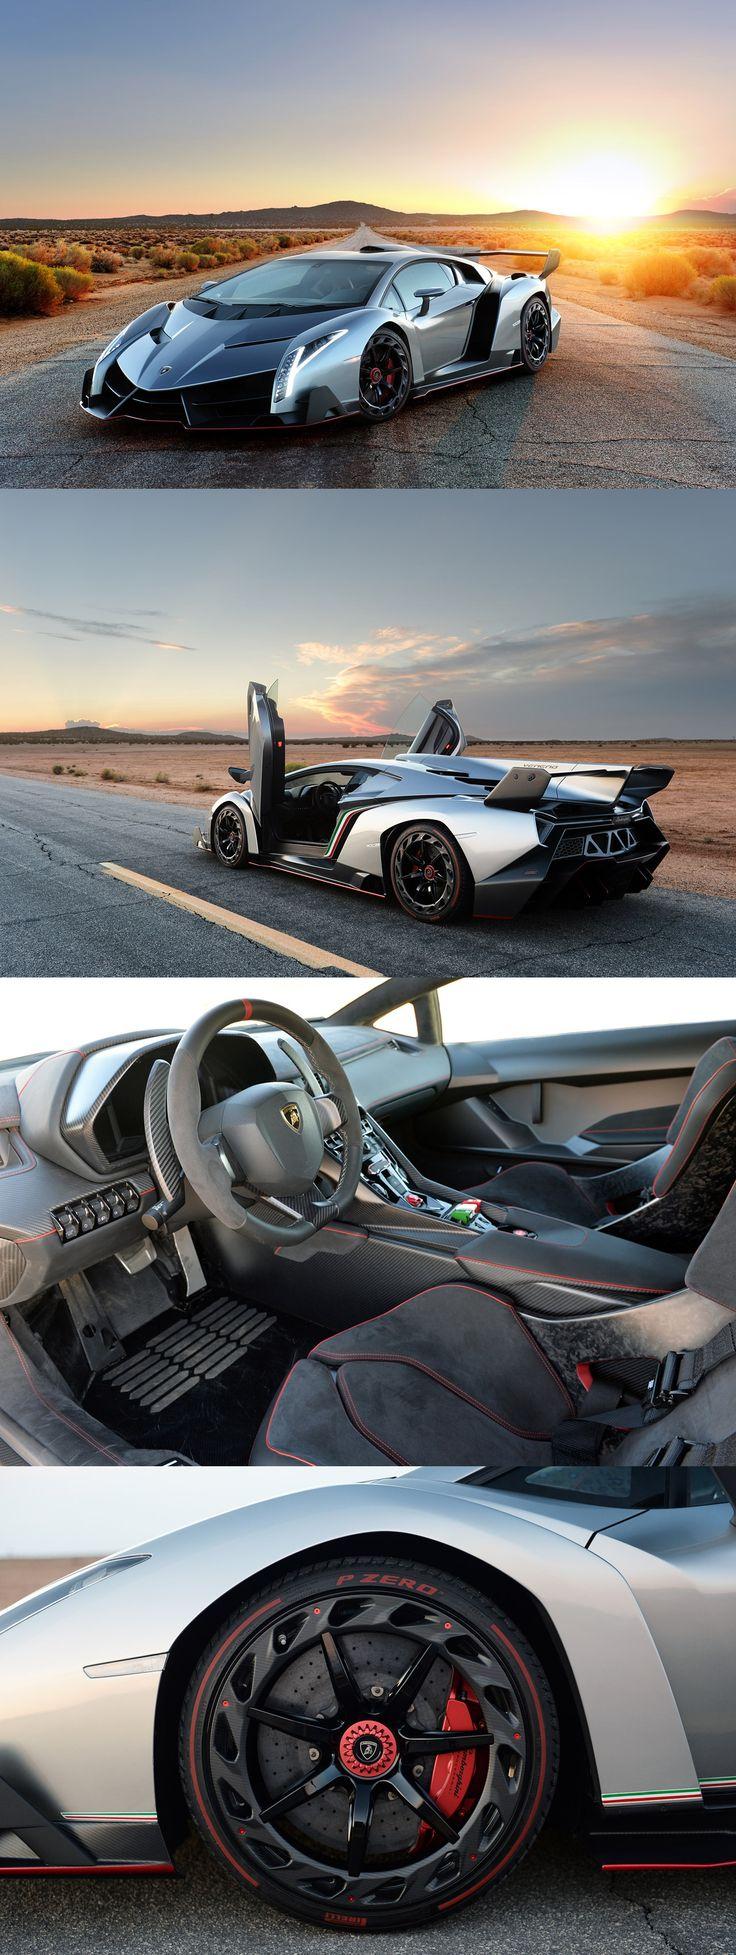 Raffaele Imperiale - Lamborghini Veneno ROAR!